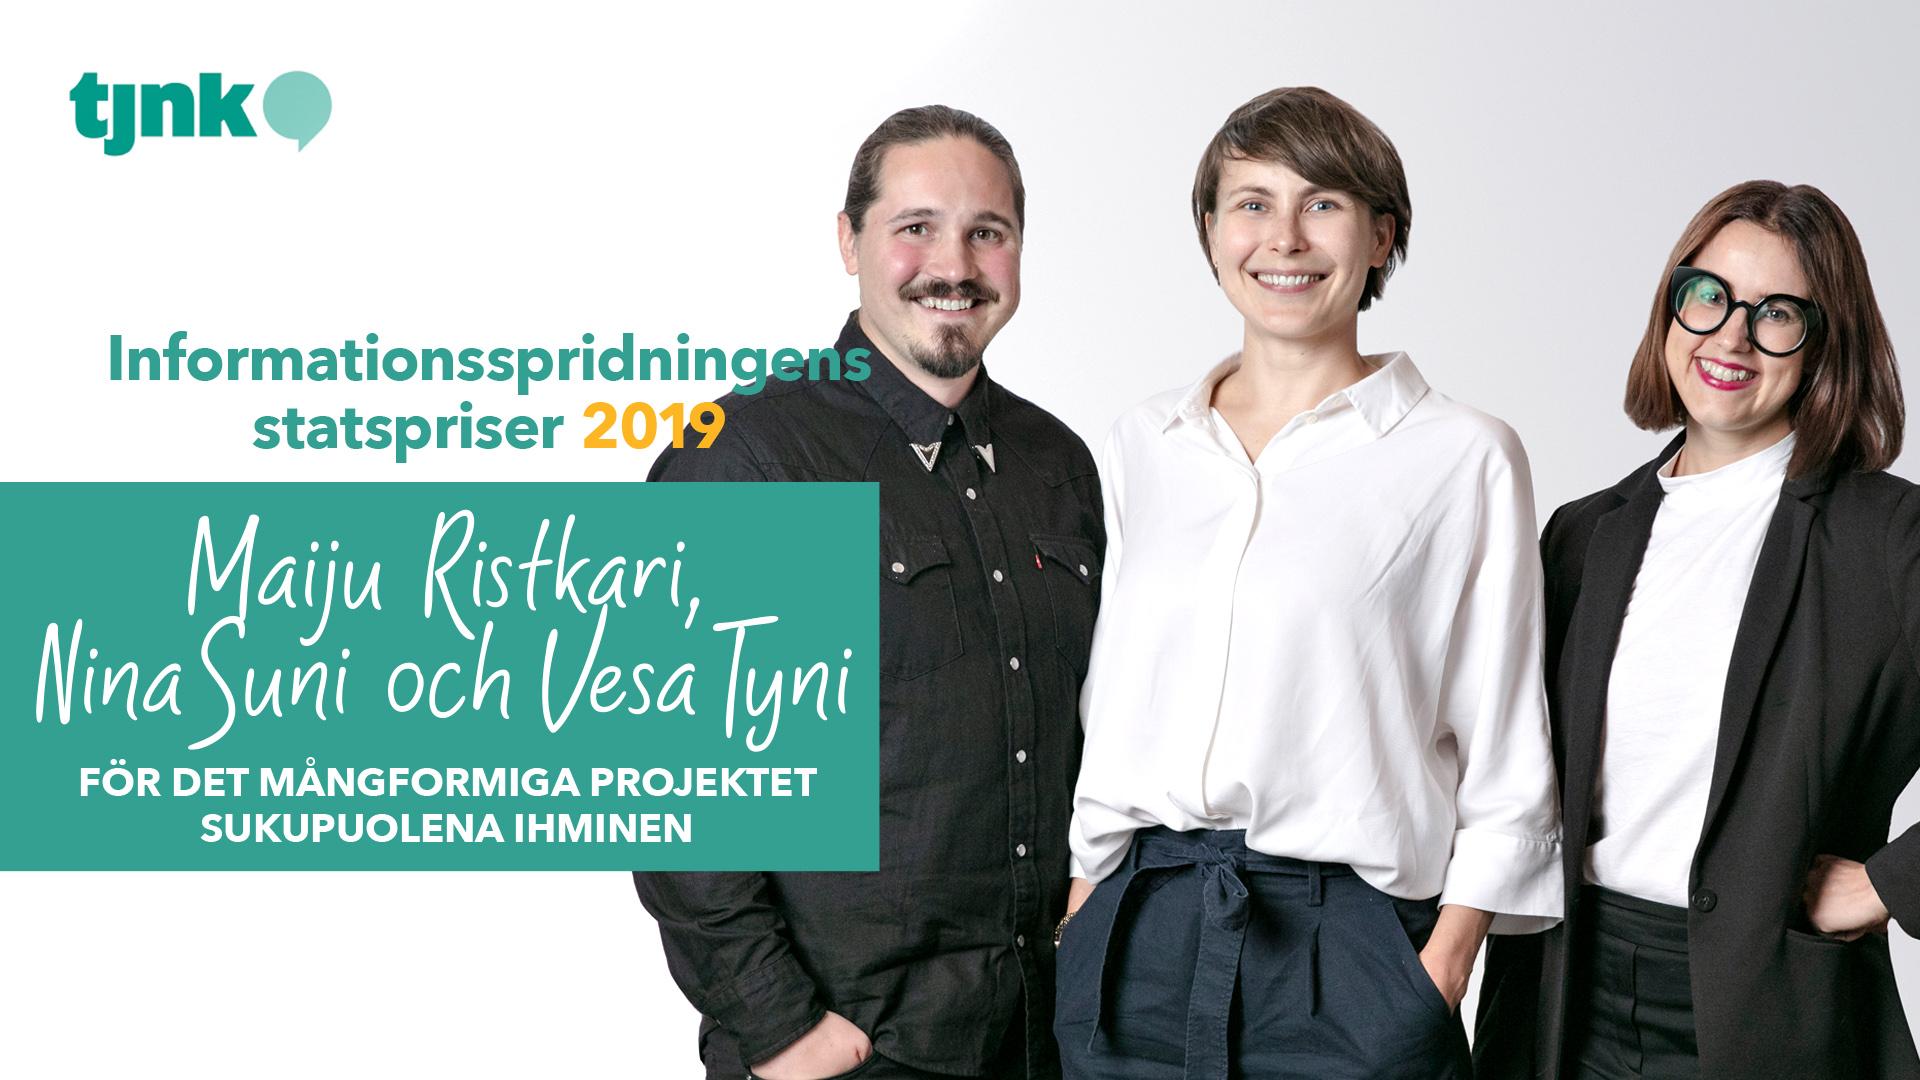 Maiju Ristkari, Nina Suni och Vesa Tyni